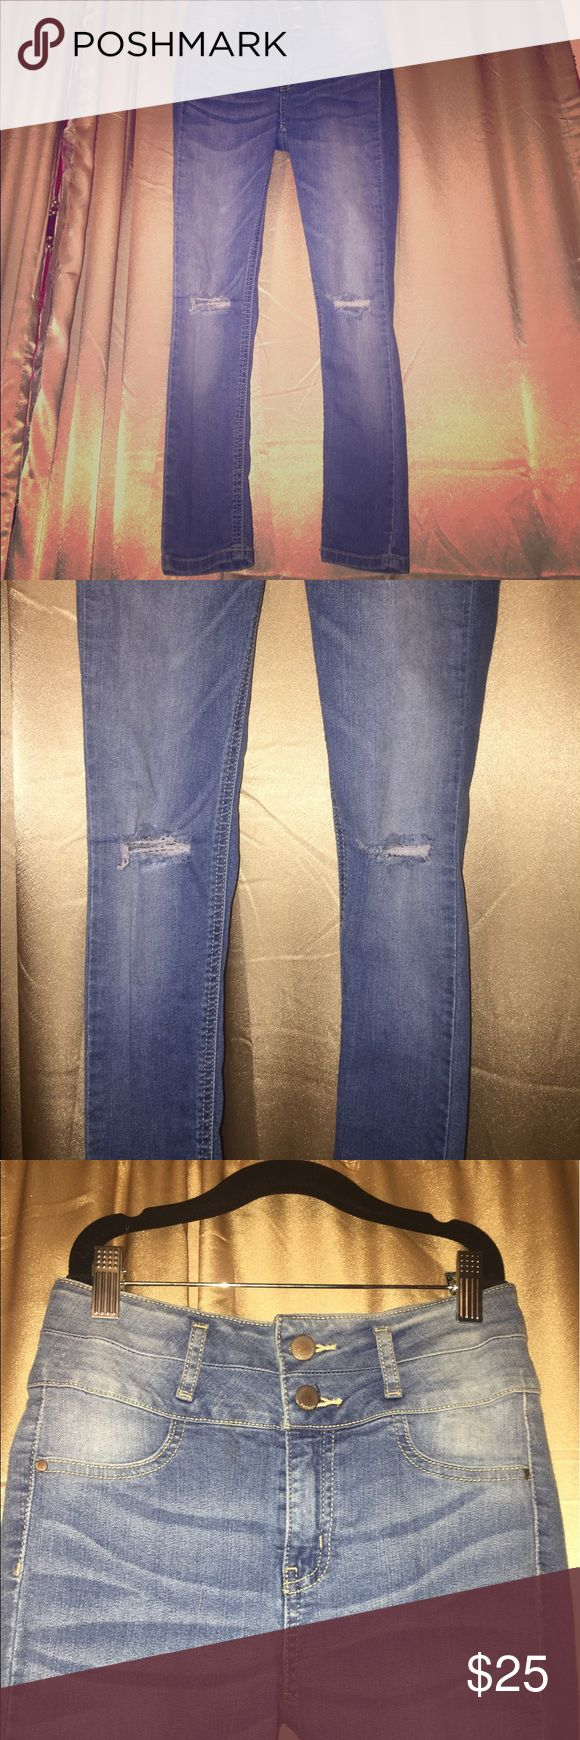 ✨black frieday sales✨Skinny jeans Very cute for everyday ware Charlotte Russe Jeans Skinny